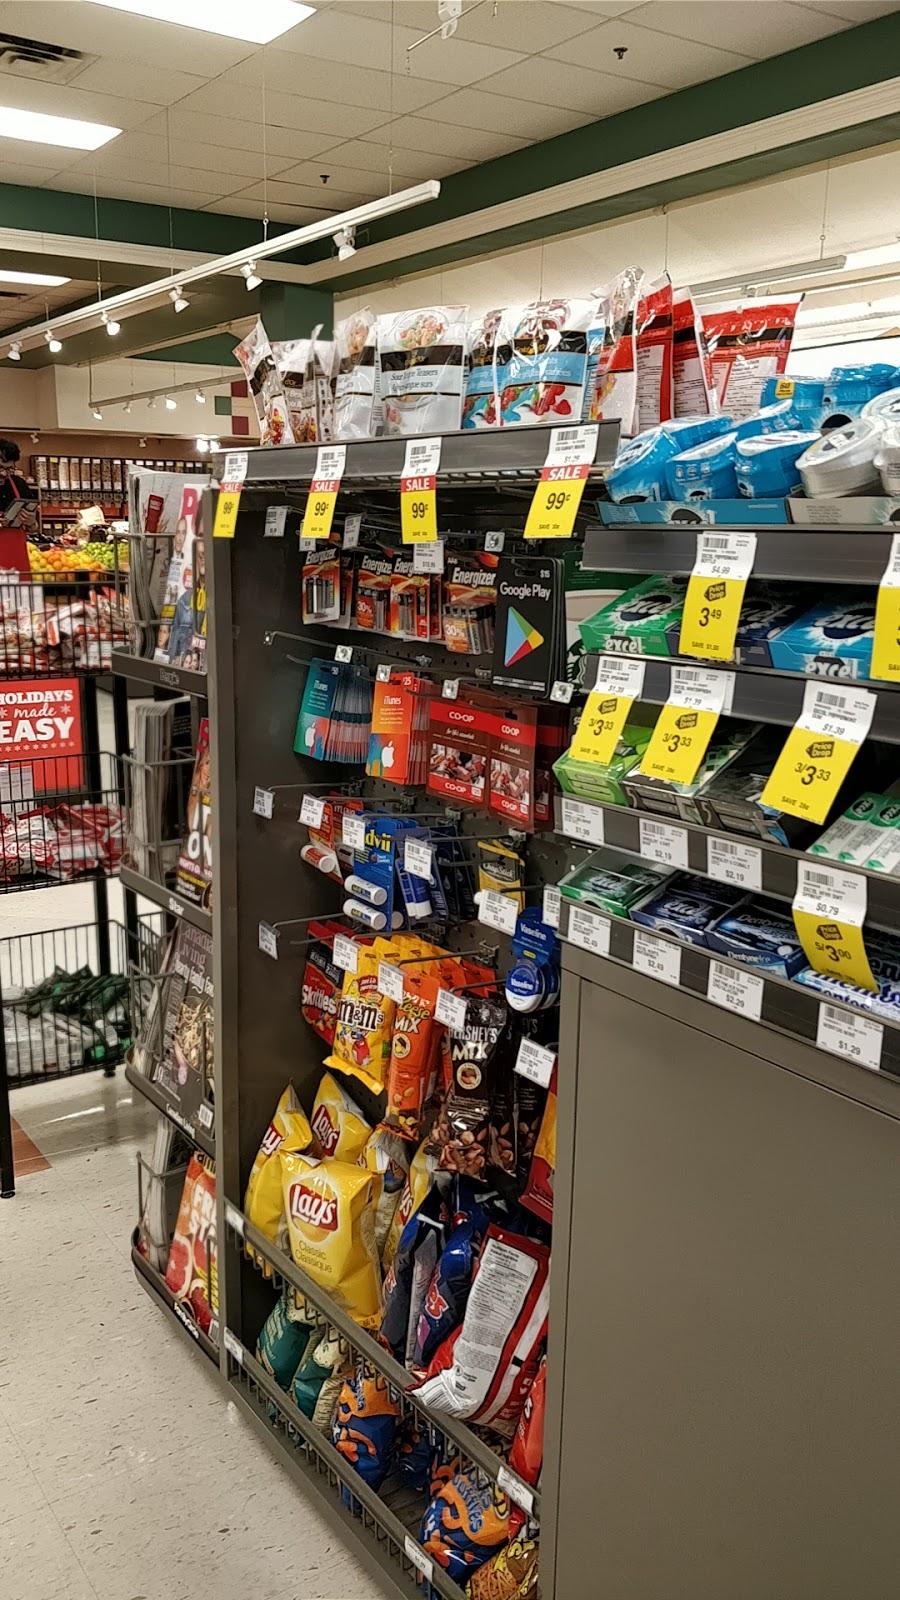 North Hill Co-op | store | 1621 5 St NE, Calgary, AB T2E 3X4, Canada | 4032994276 OR +1 403-299-4276